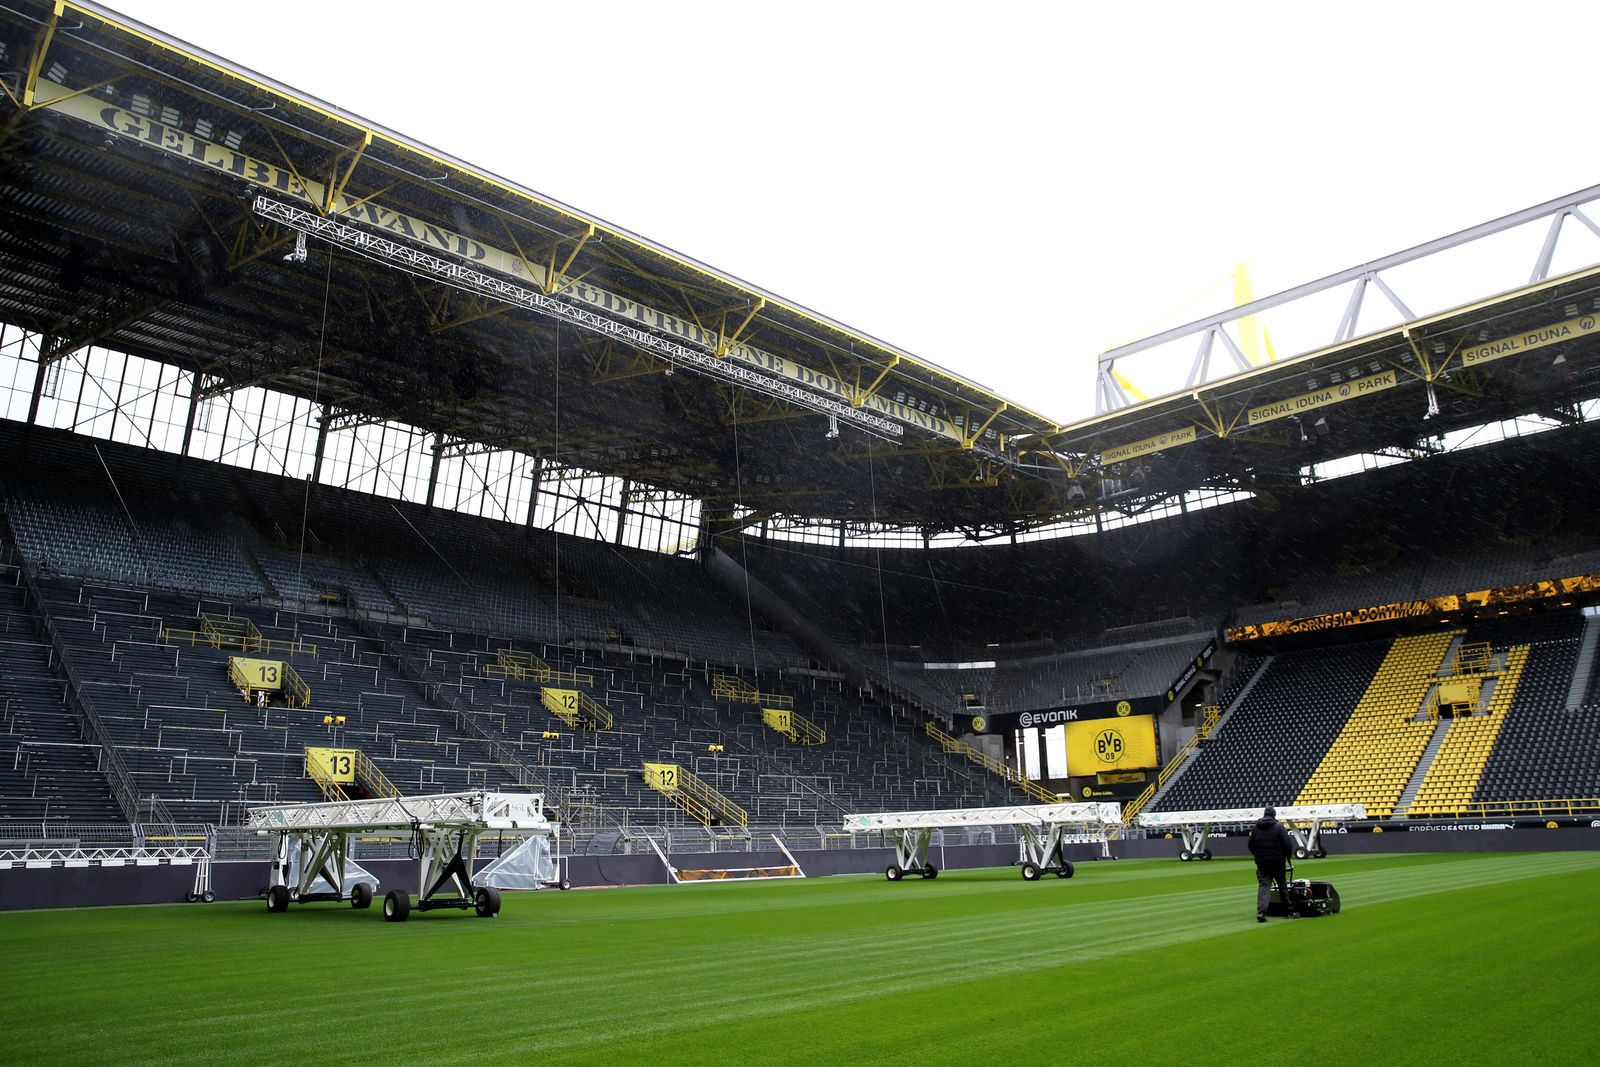 Bundesliga Matchday 26 Will Be Played Behind Closed Doors Despite The Coronavirus Spread